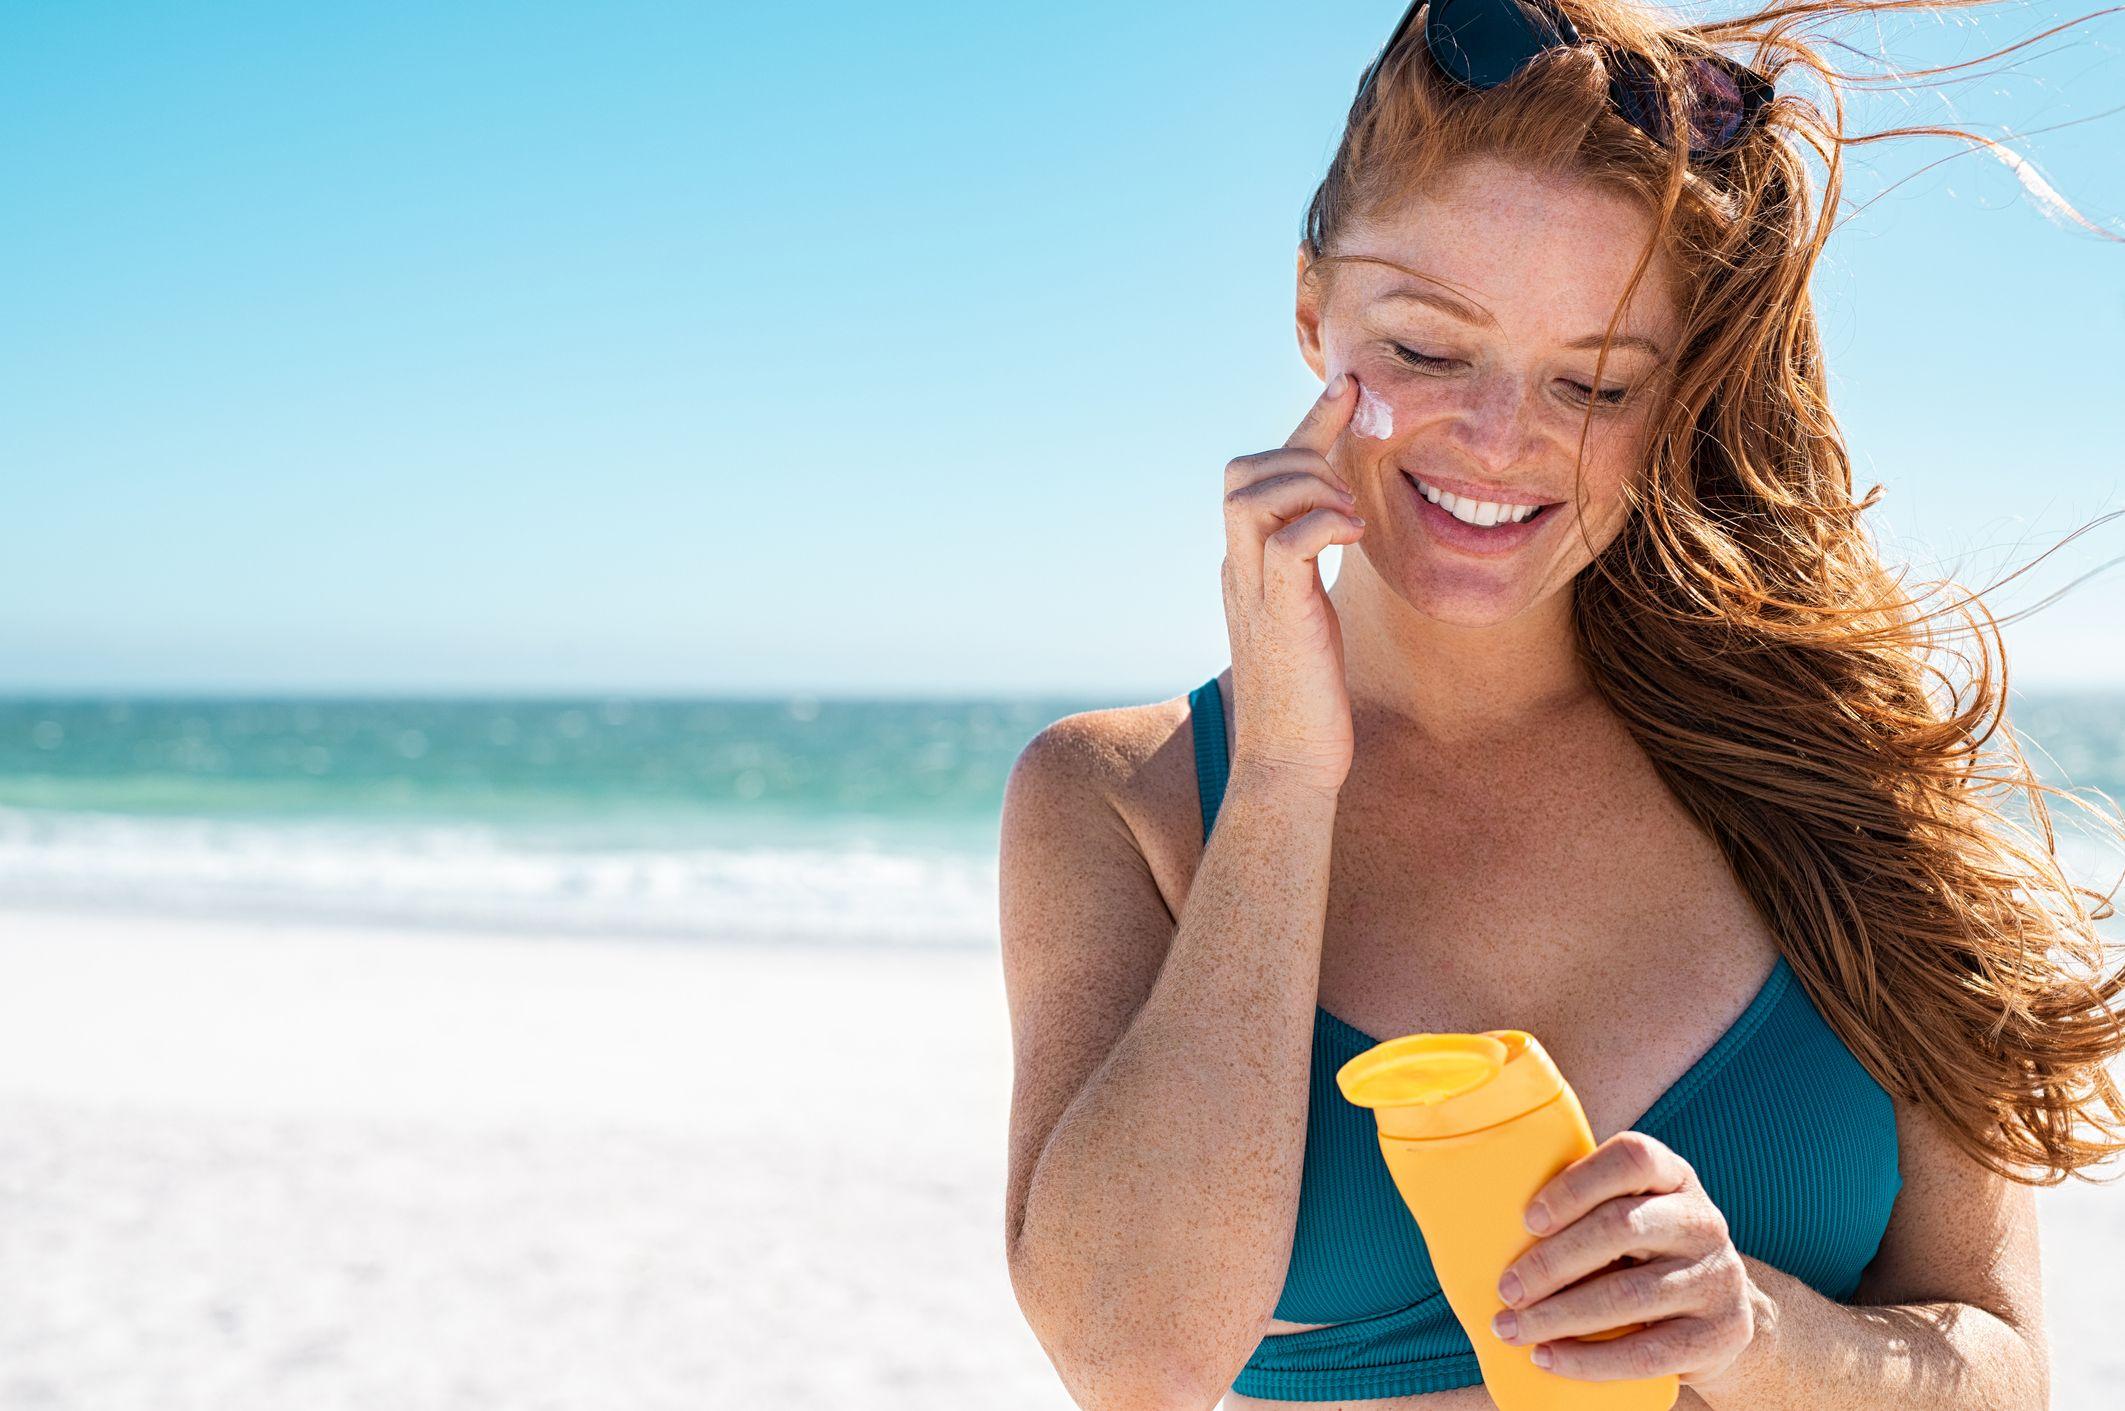 Image result for sunscreen girls